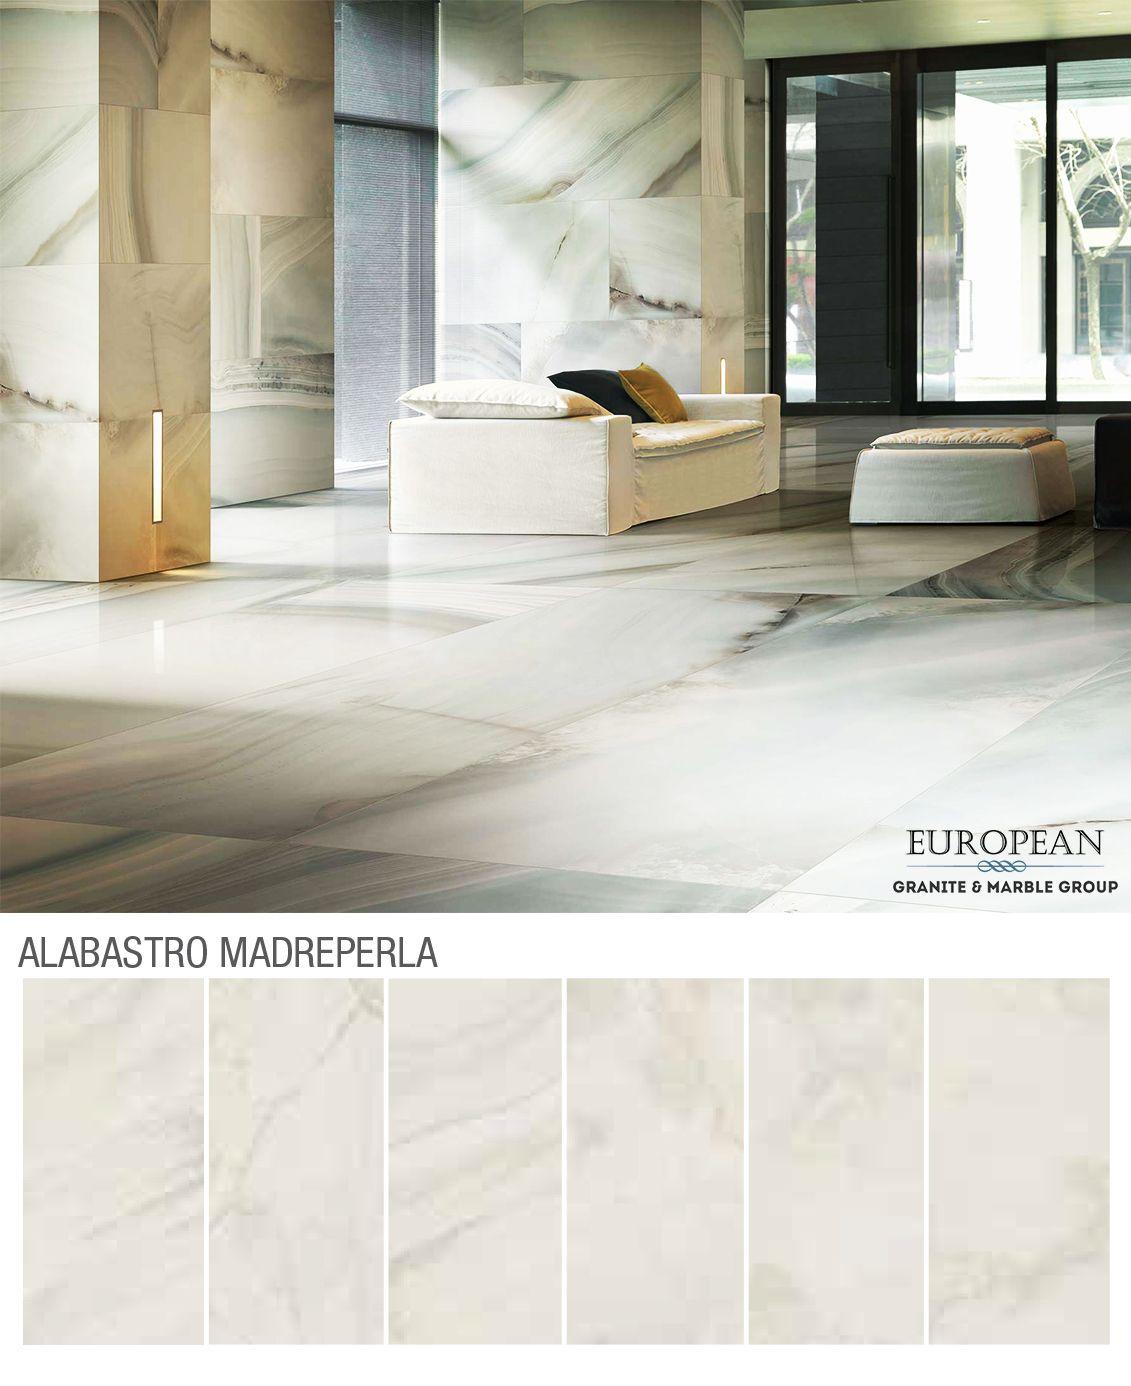 Our Florim Luxury Porcelain Tiles Make A Great First Impression Seen Here In The Design Alabastro Madreperla Polished S Foyer Design Marble Granite Design